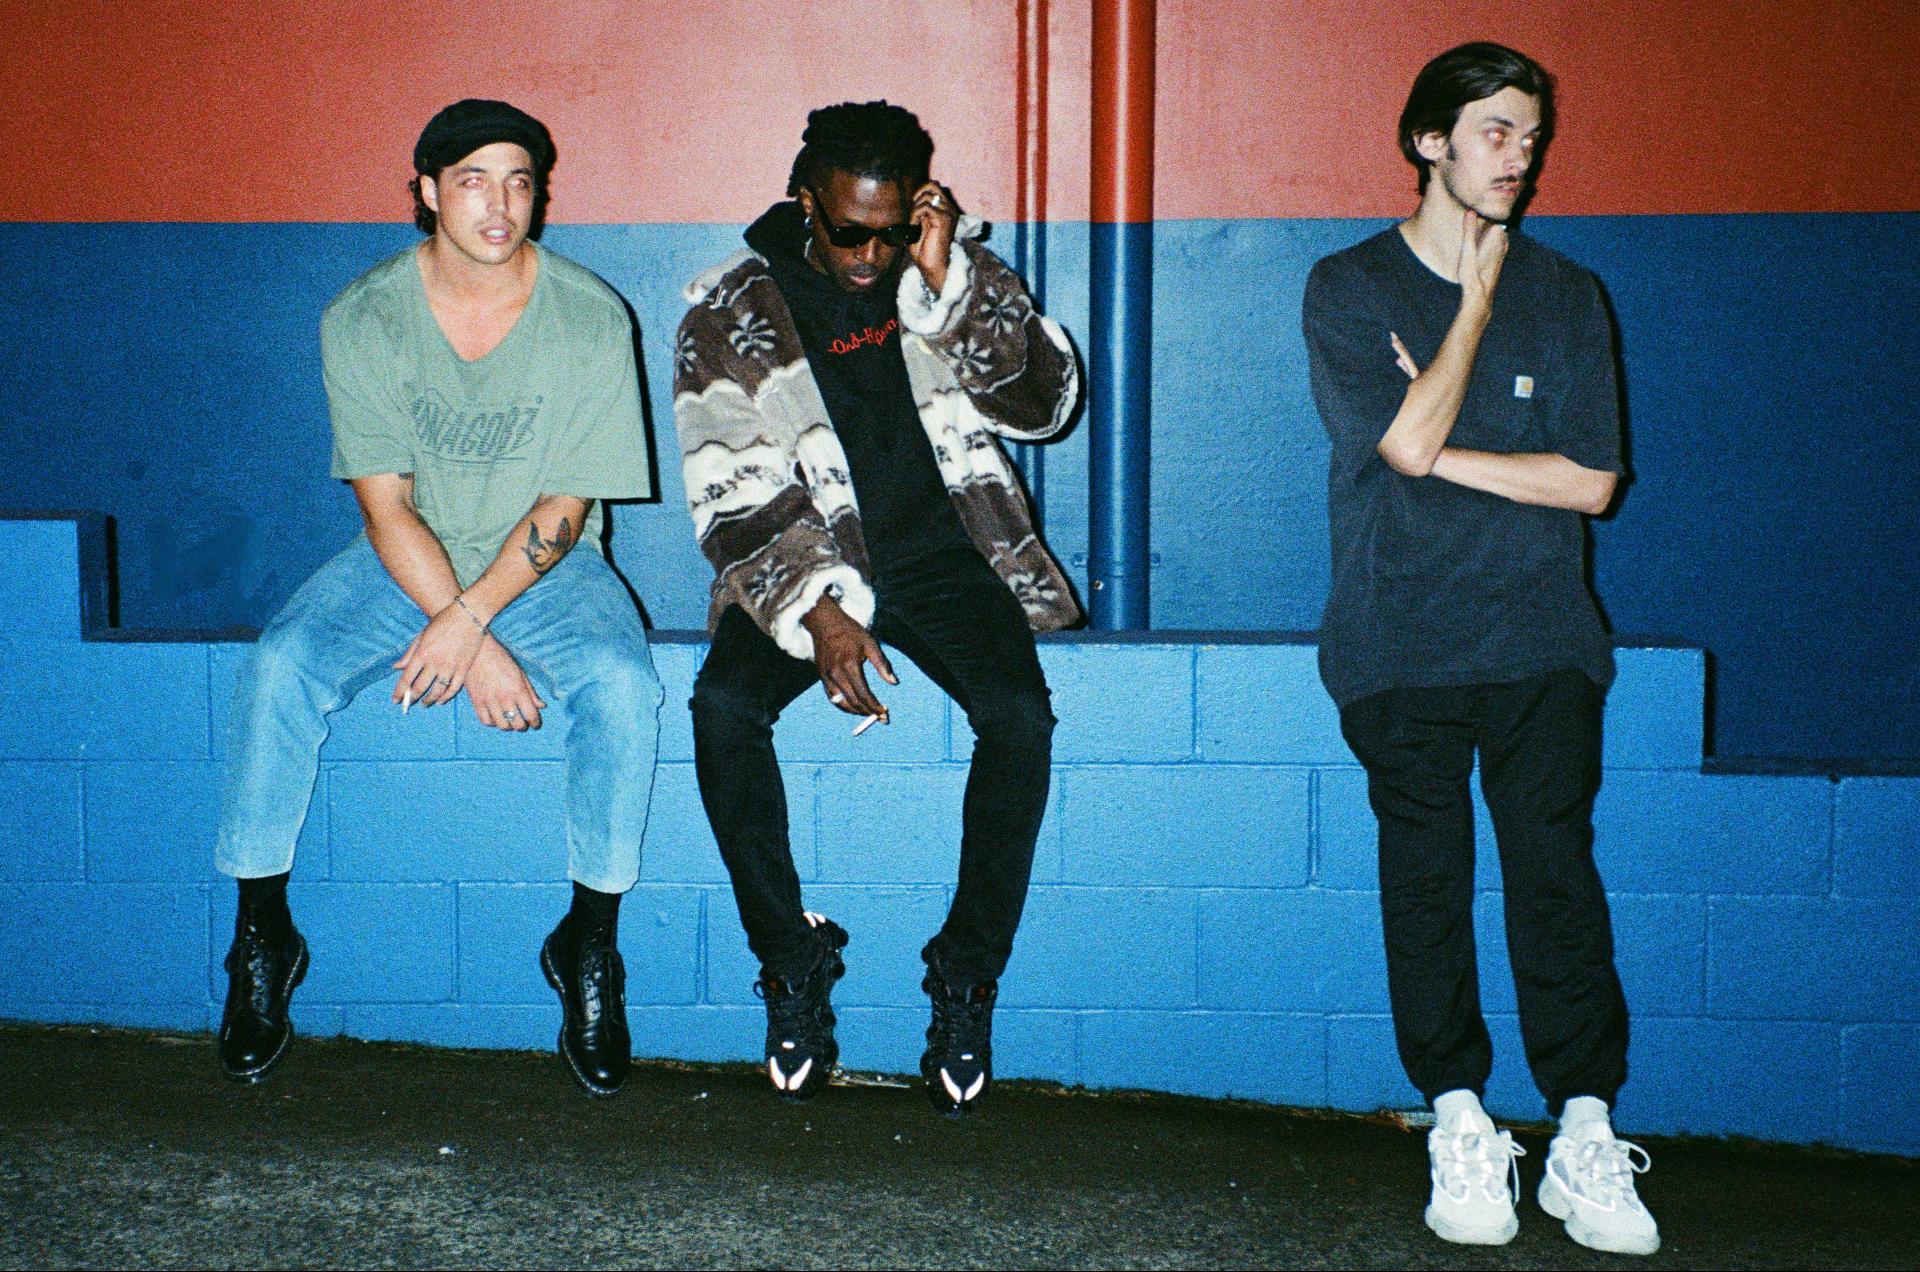 THE RIOT Unleash New Single 'Same Blunt'